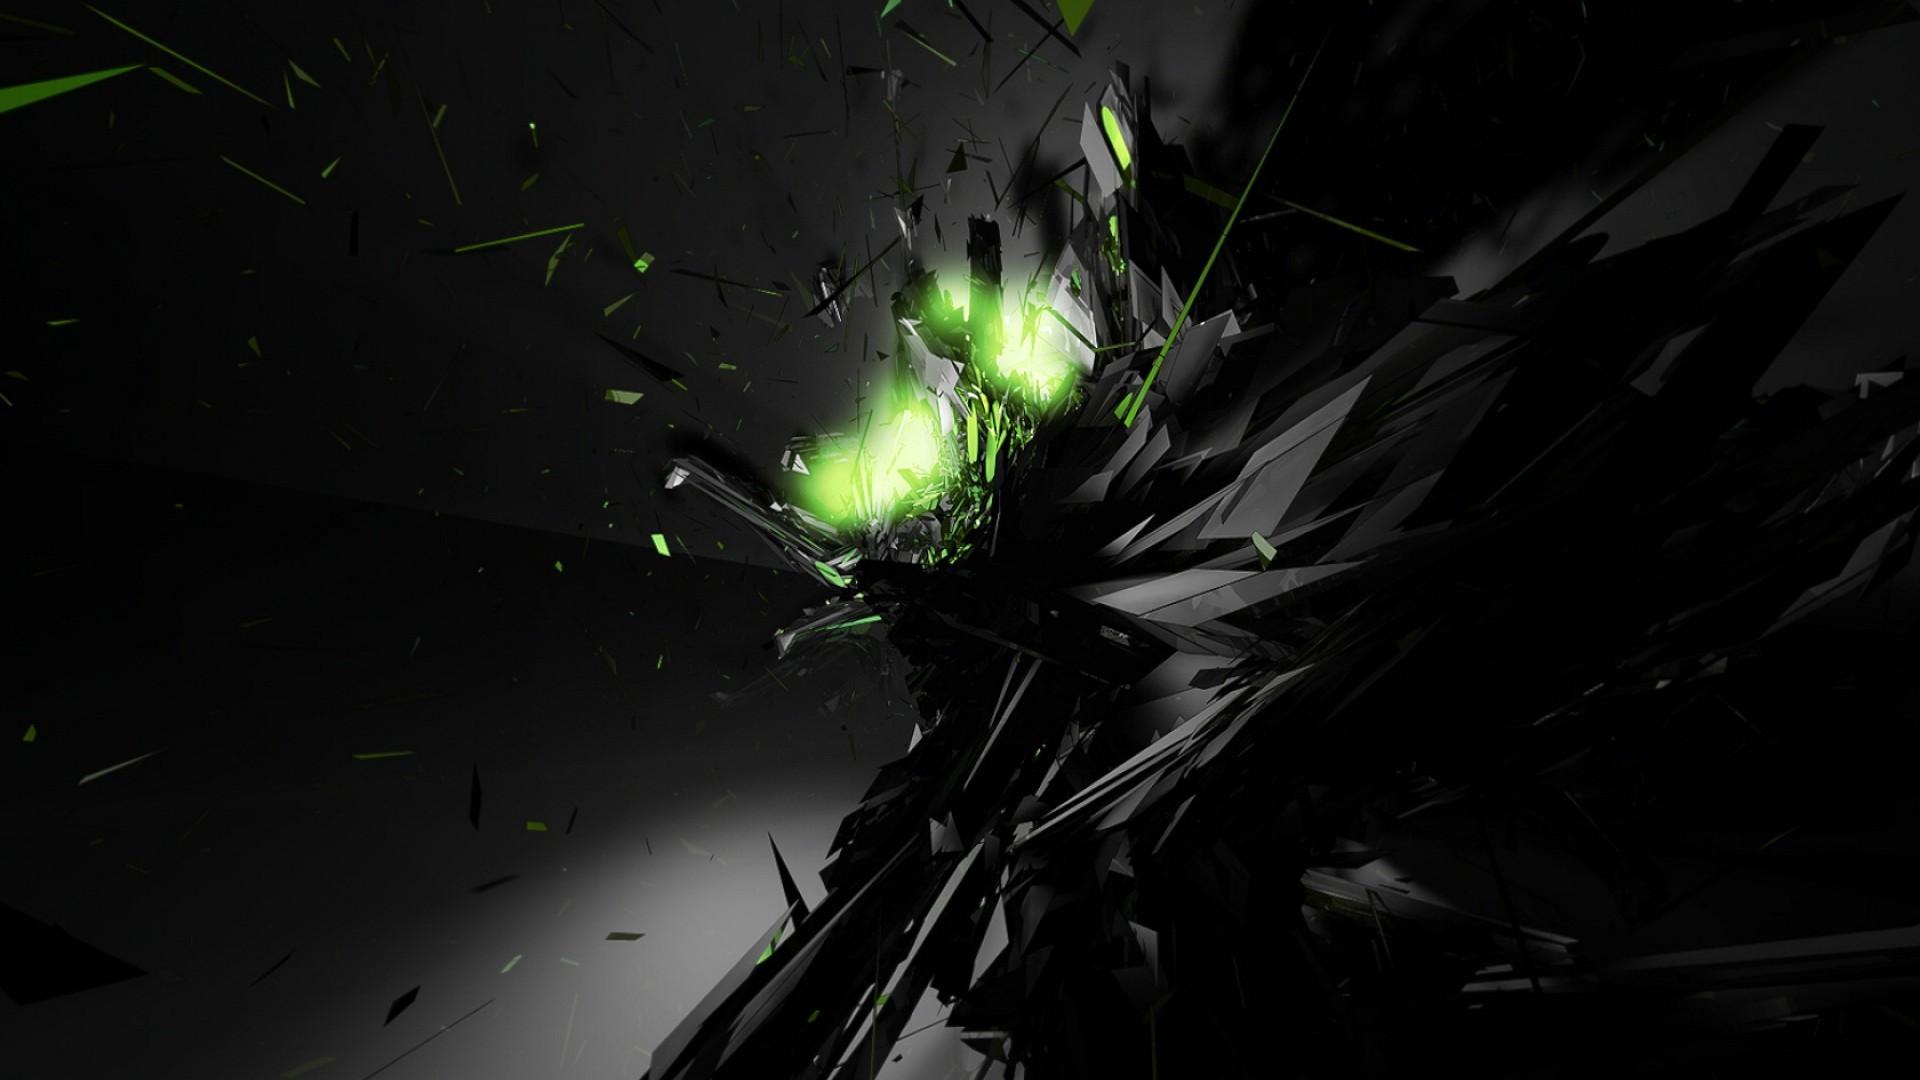 Black Abstract Green Glow Desktop Wallpaper